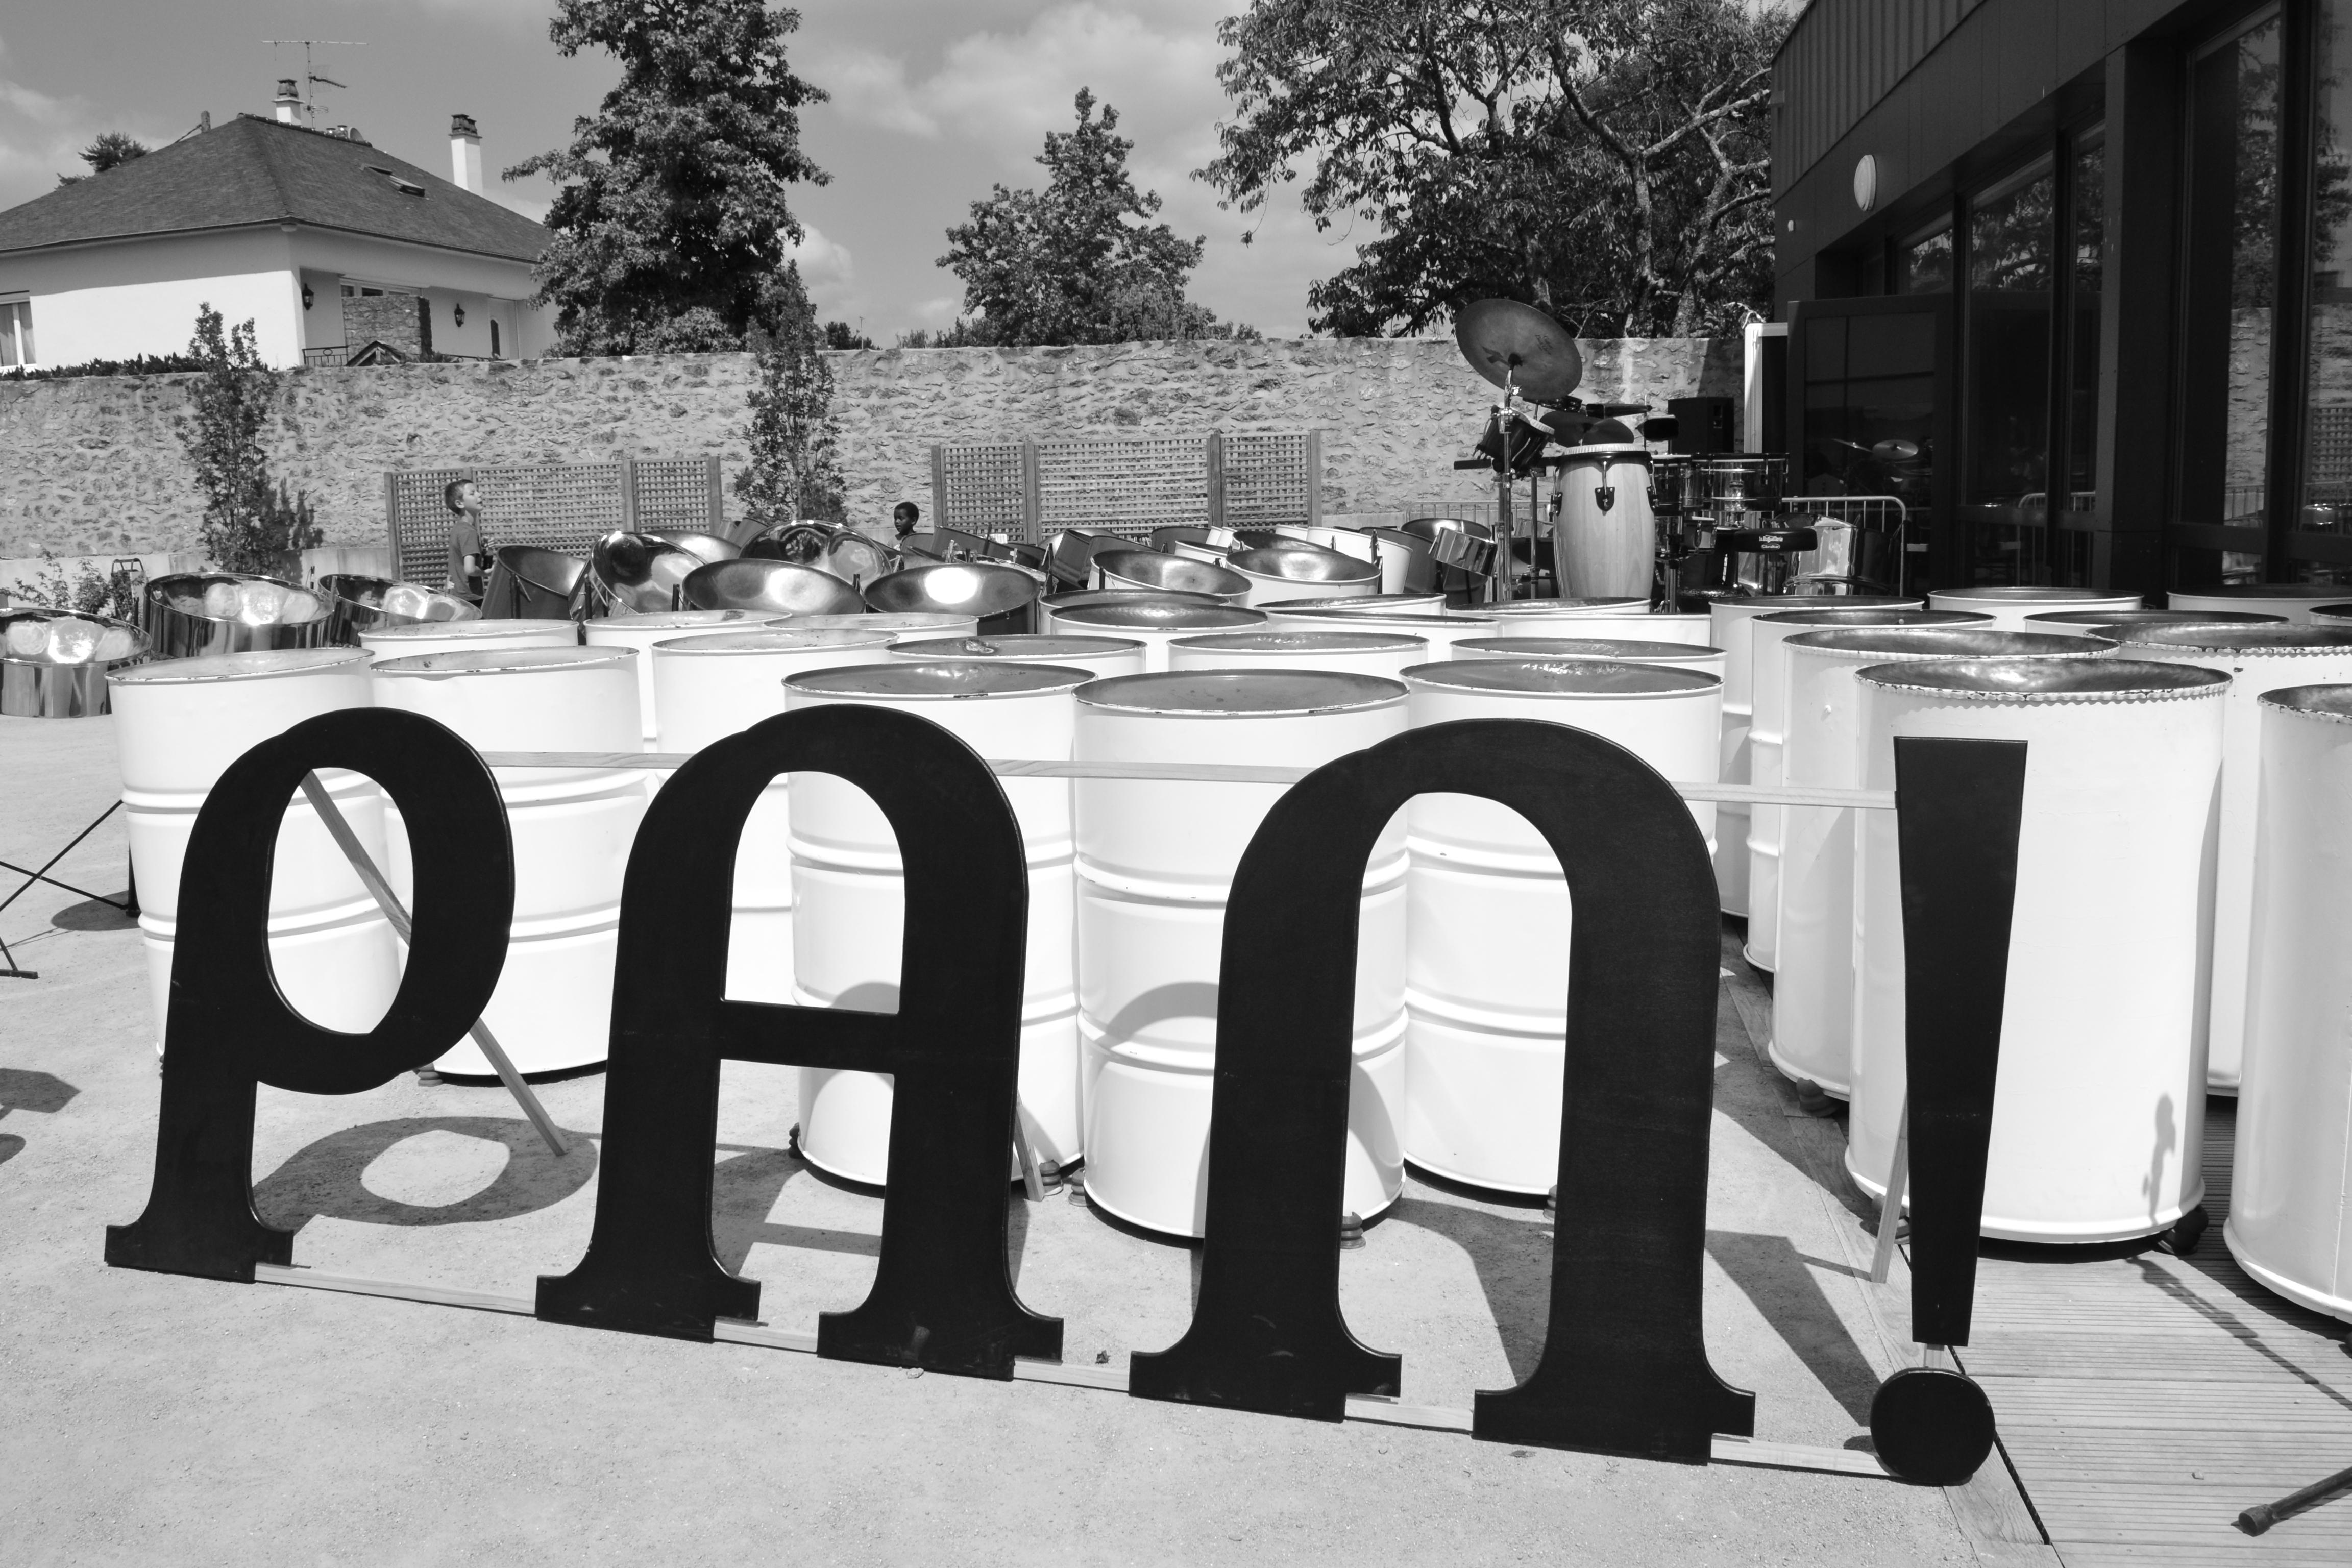 PAN#1 - 2014.1